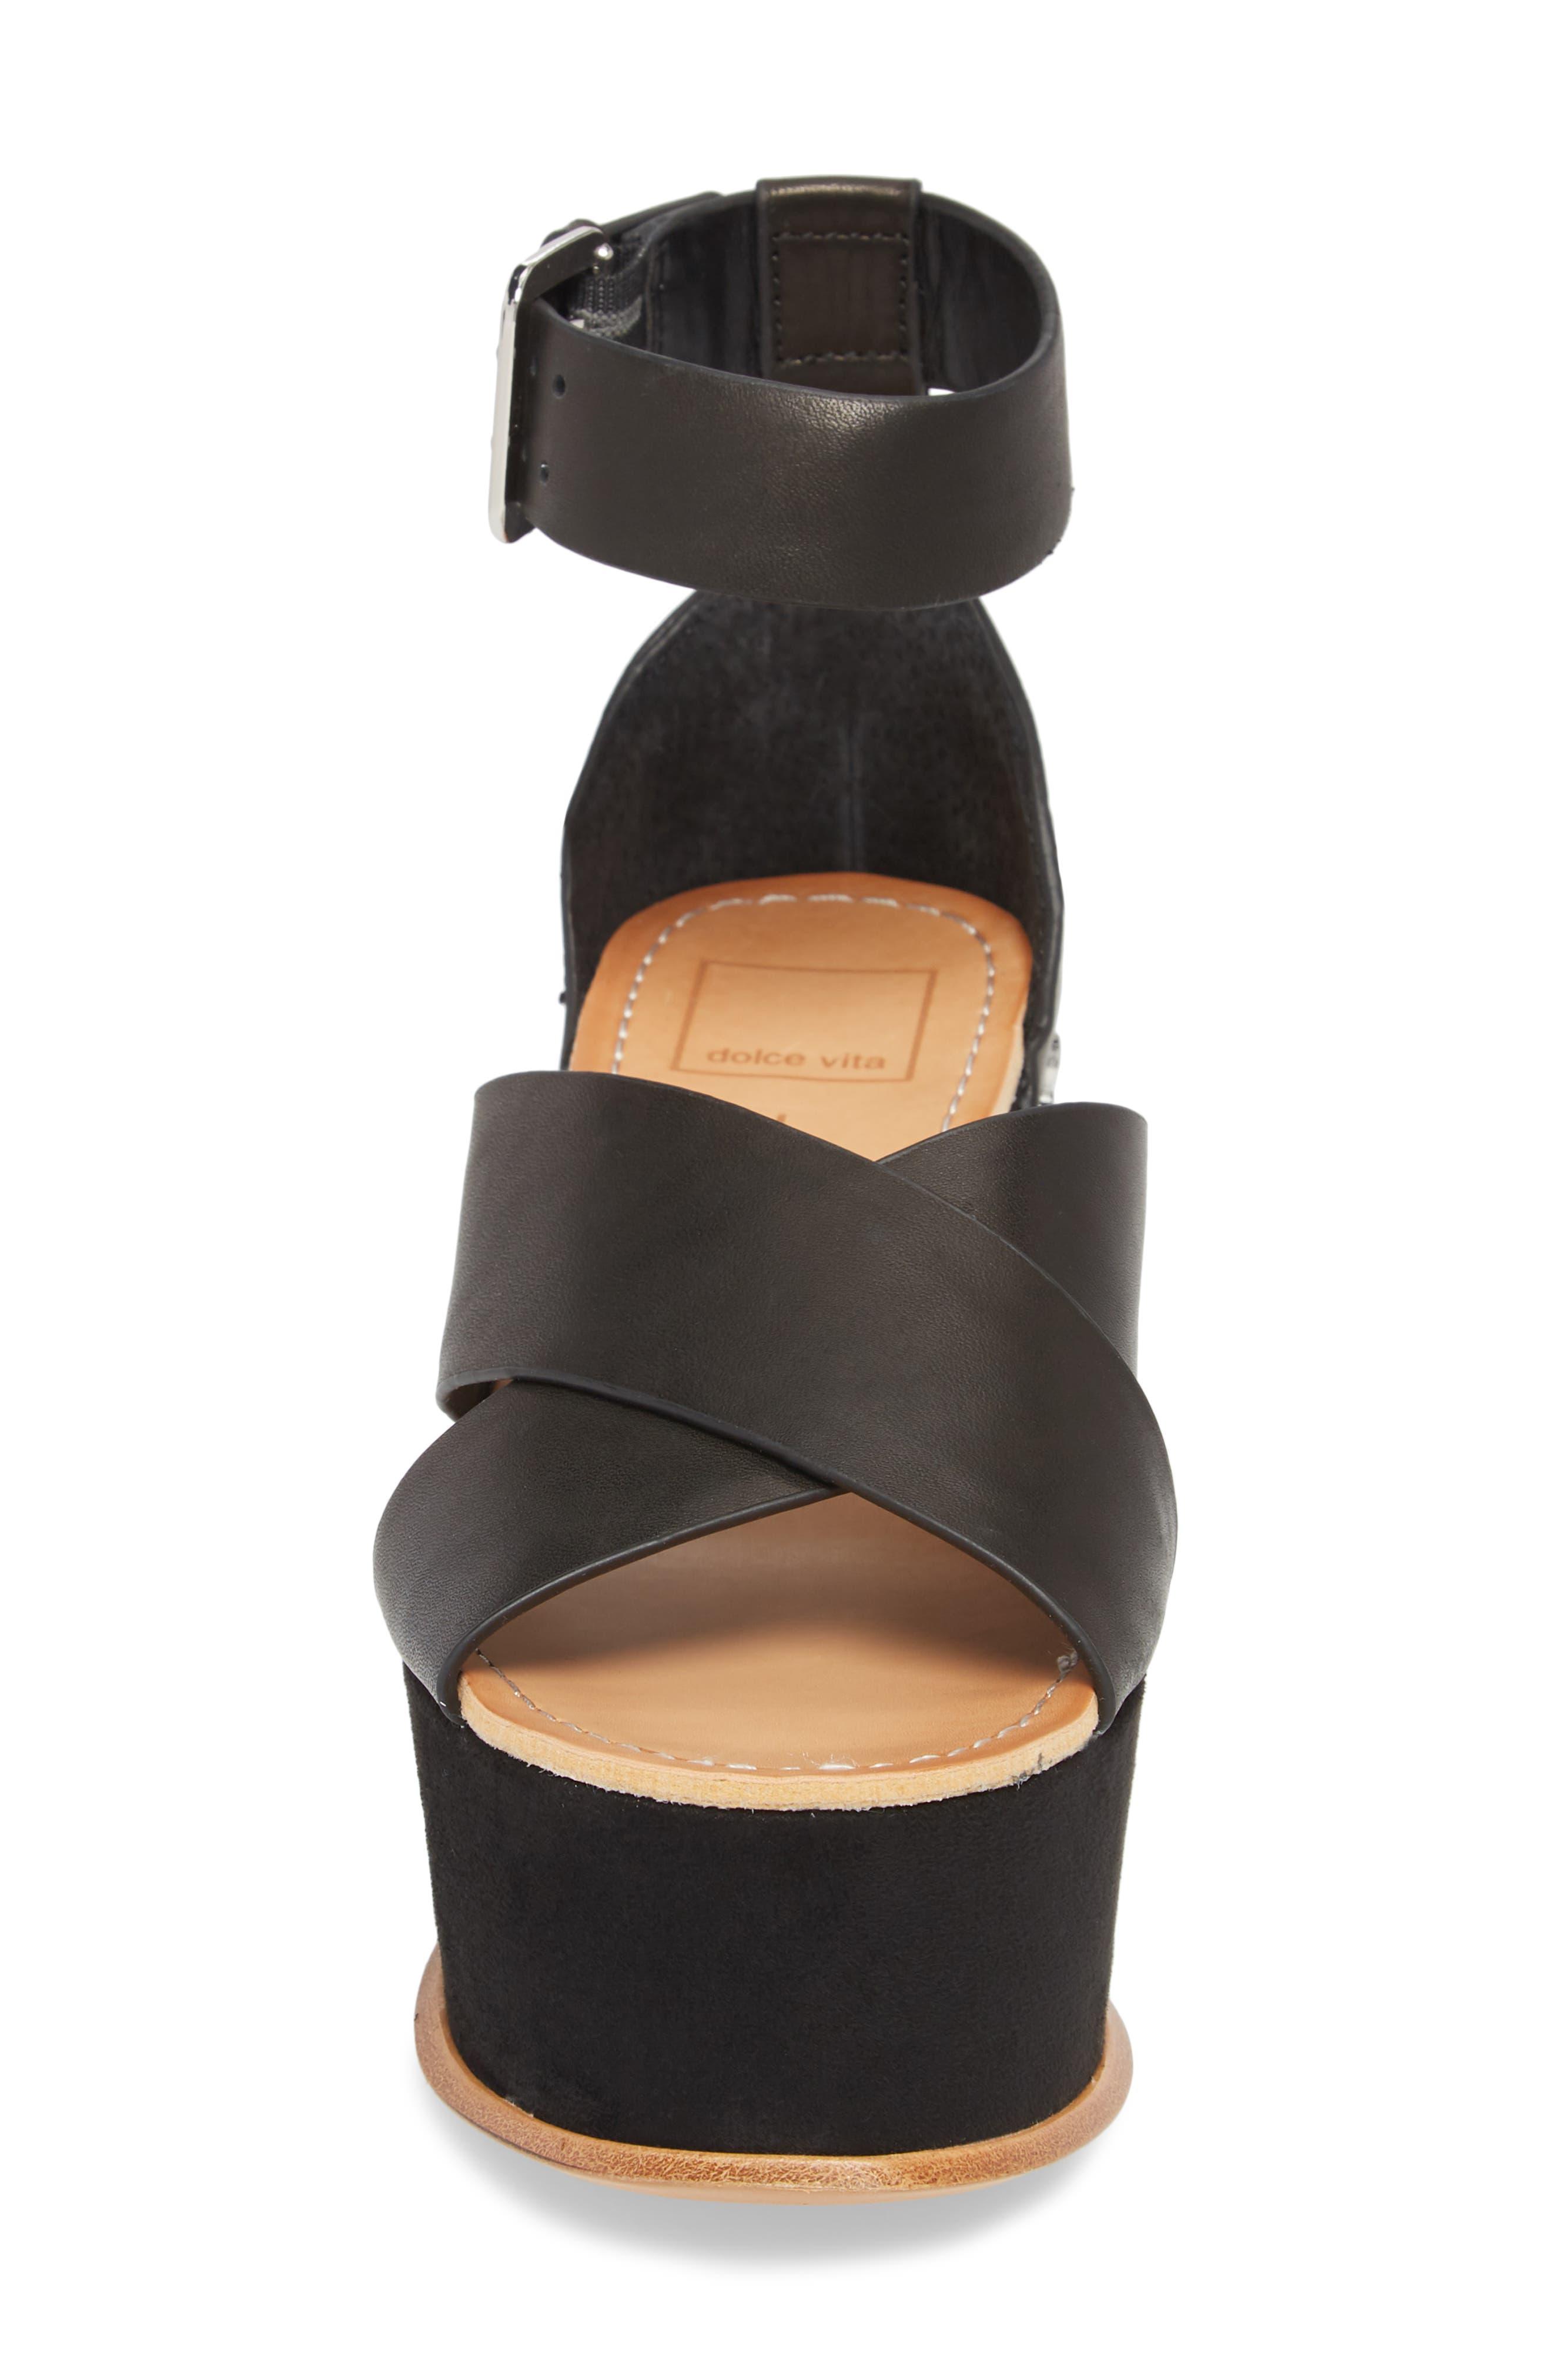 DOLCE VITA,                             Dalrae Platform Wedge Sandal,                             Alternate thumbnail 4, color,                             001